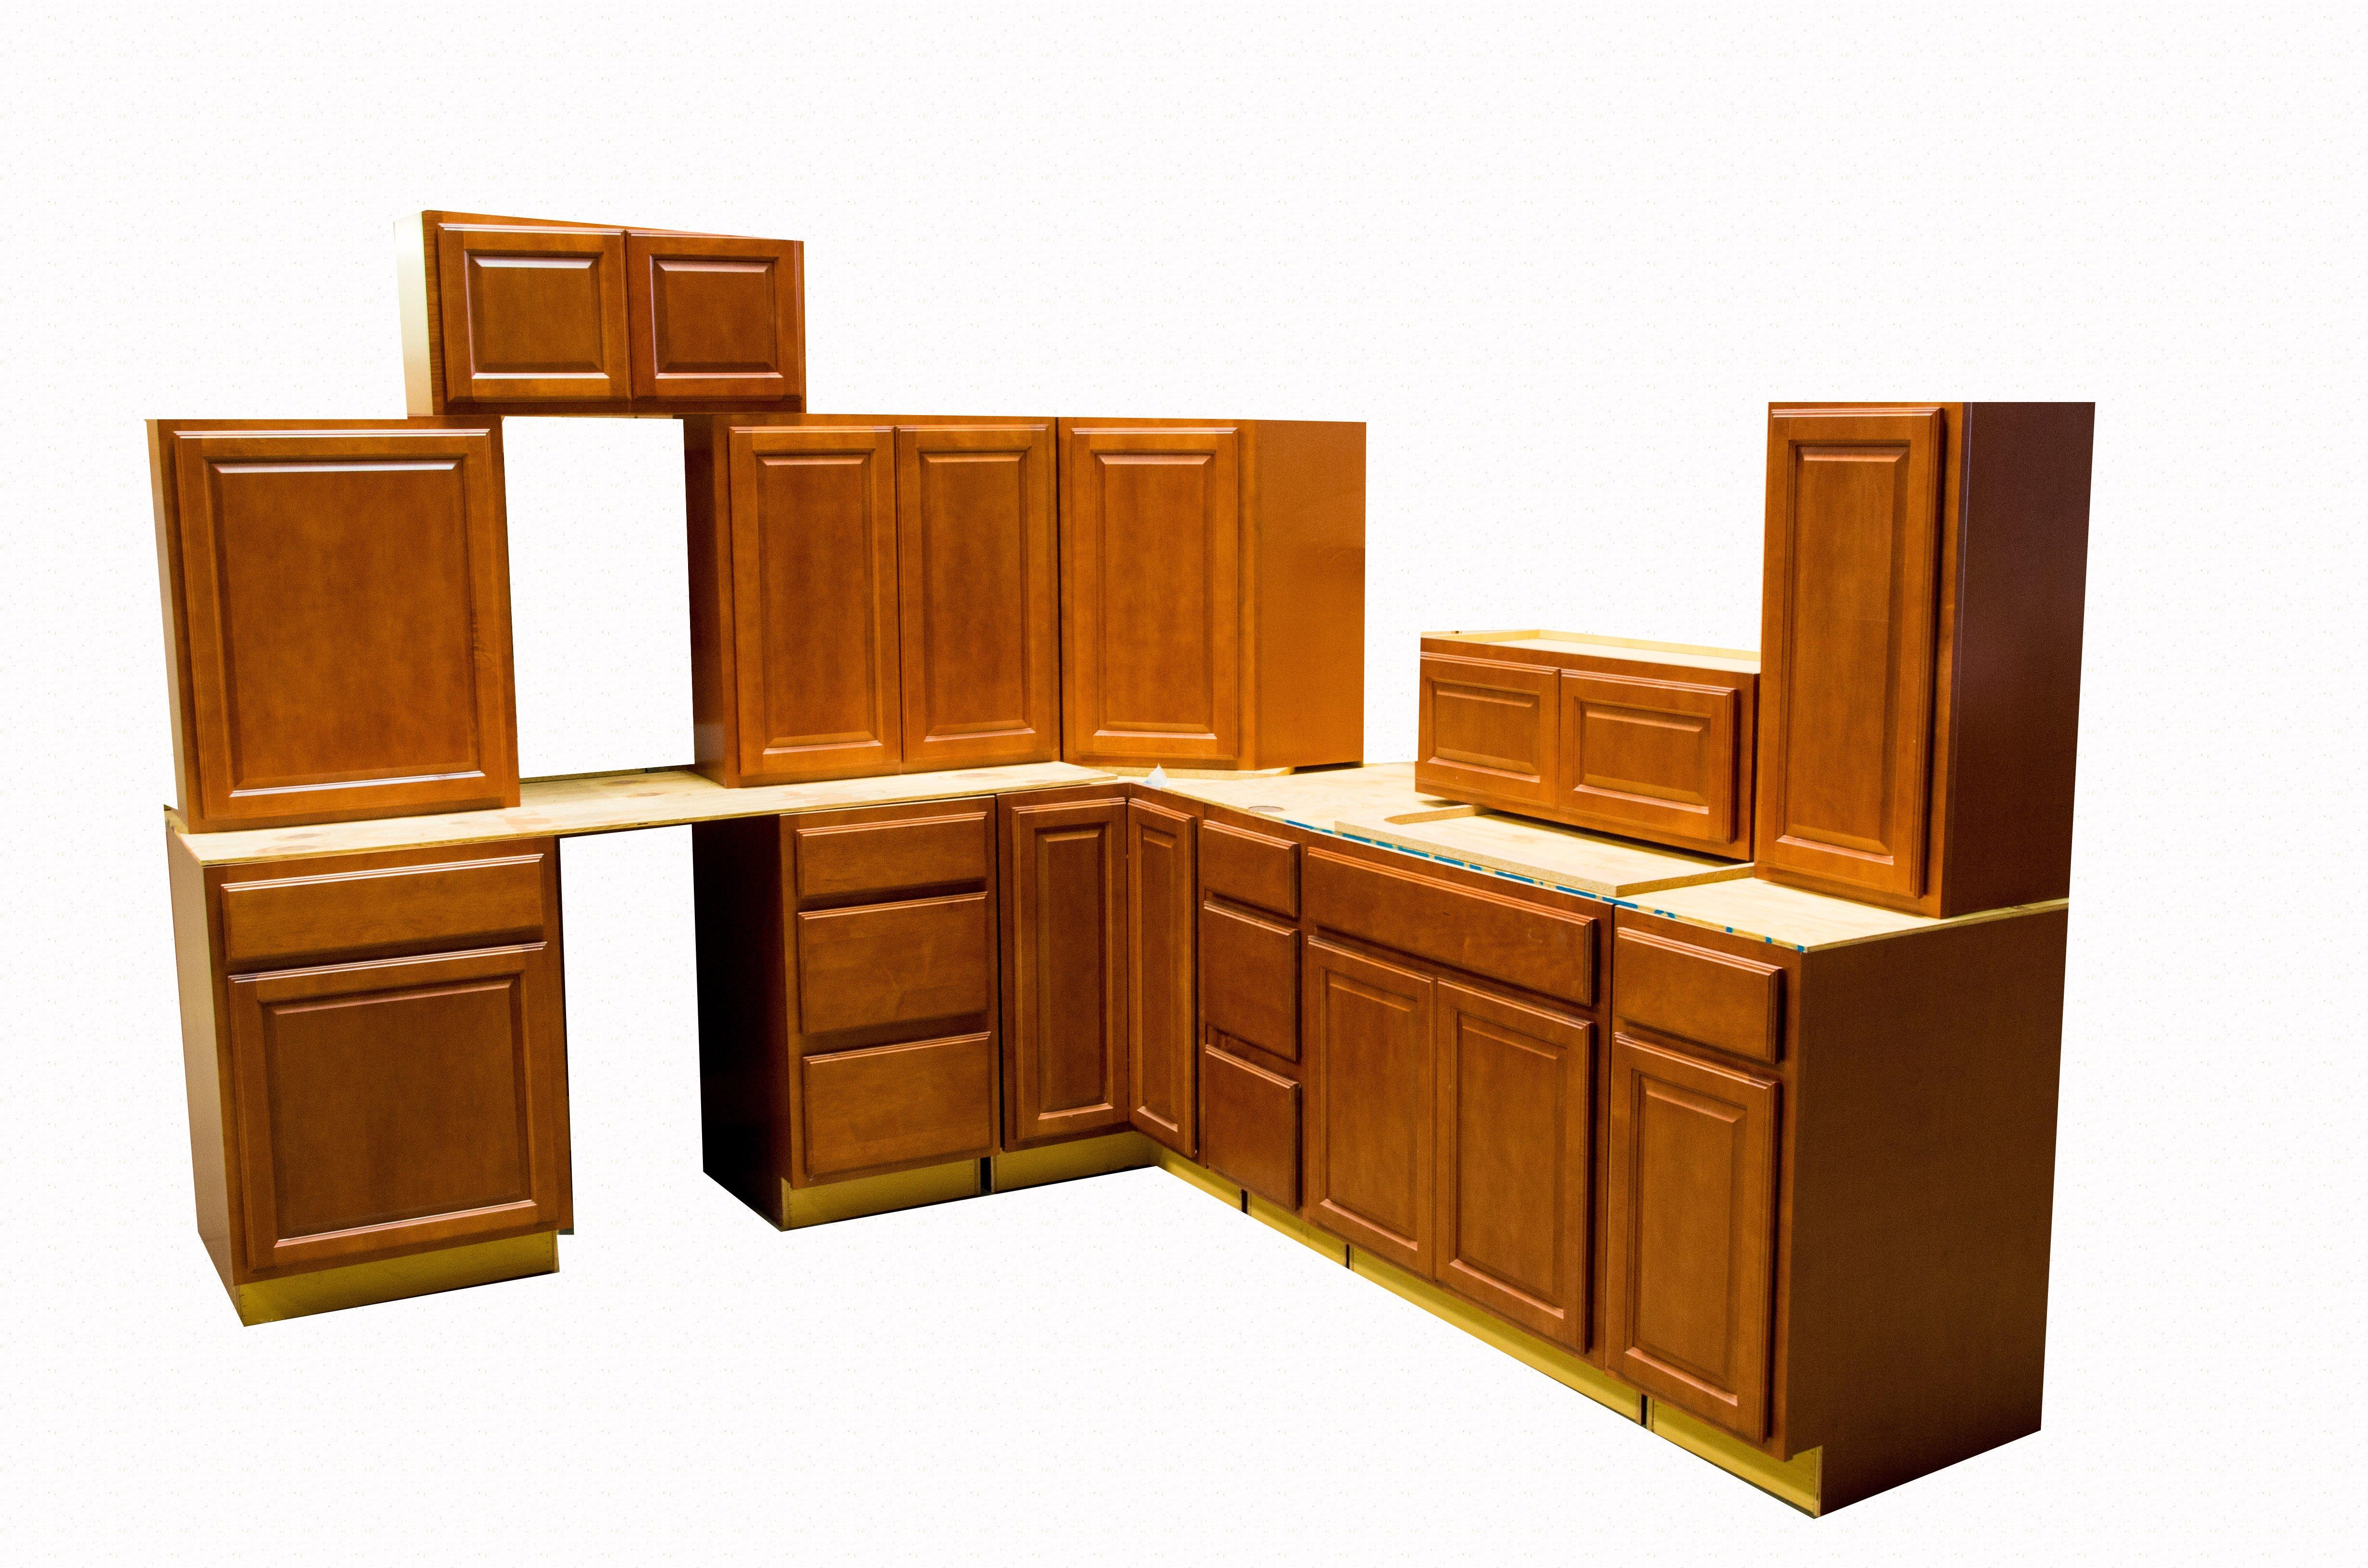 Cabinets Plus Irvine Cabinet Factories Outlet Orange